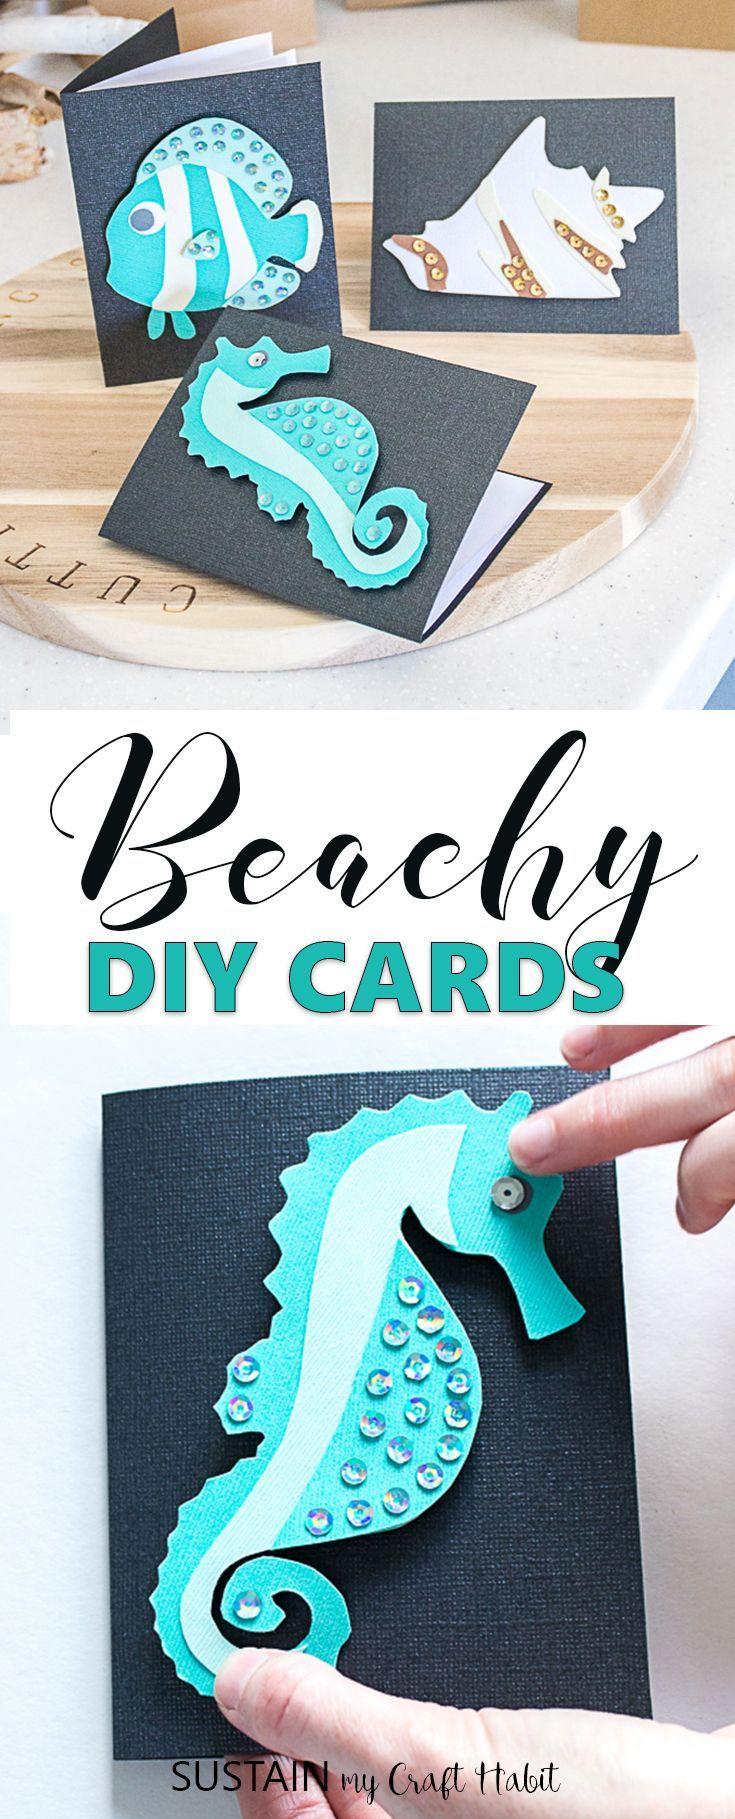 Diy beach themed greeting cards crafts pinterest diy cards